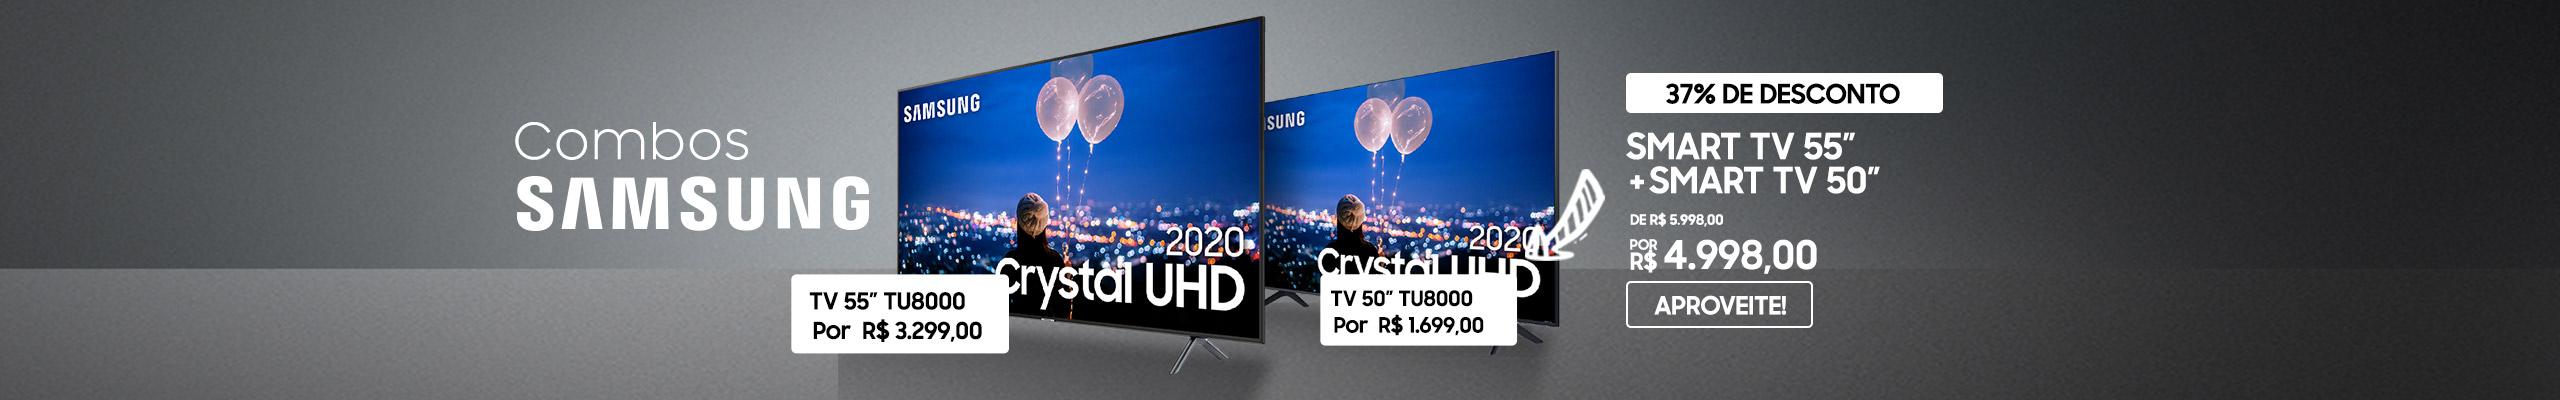 Combo TV